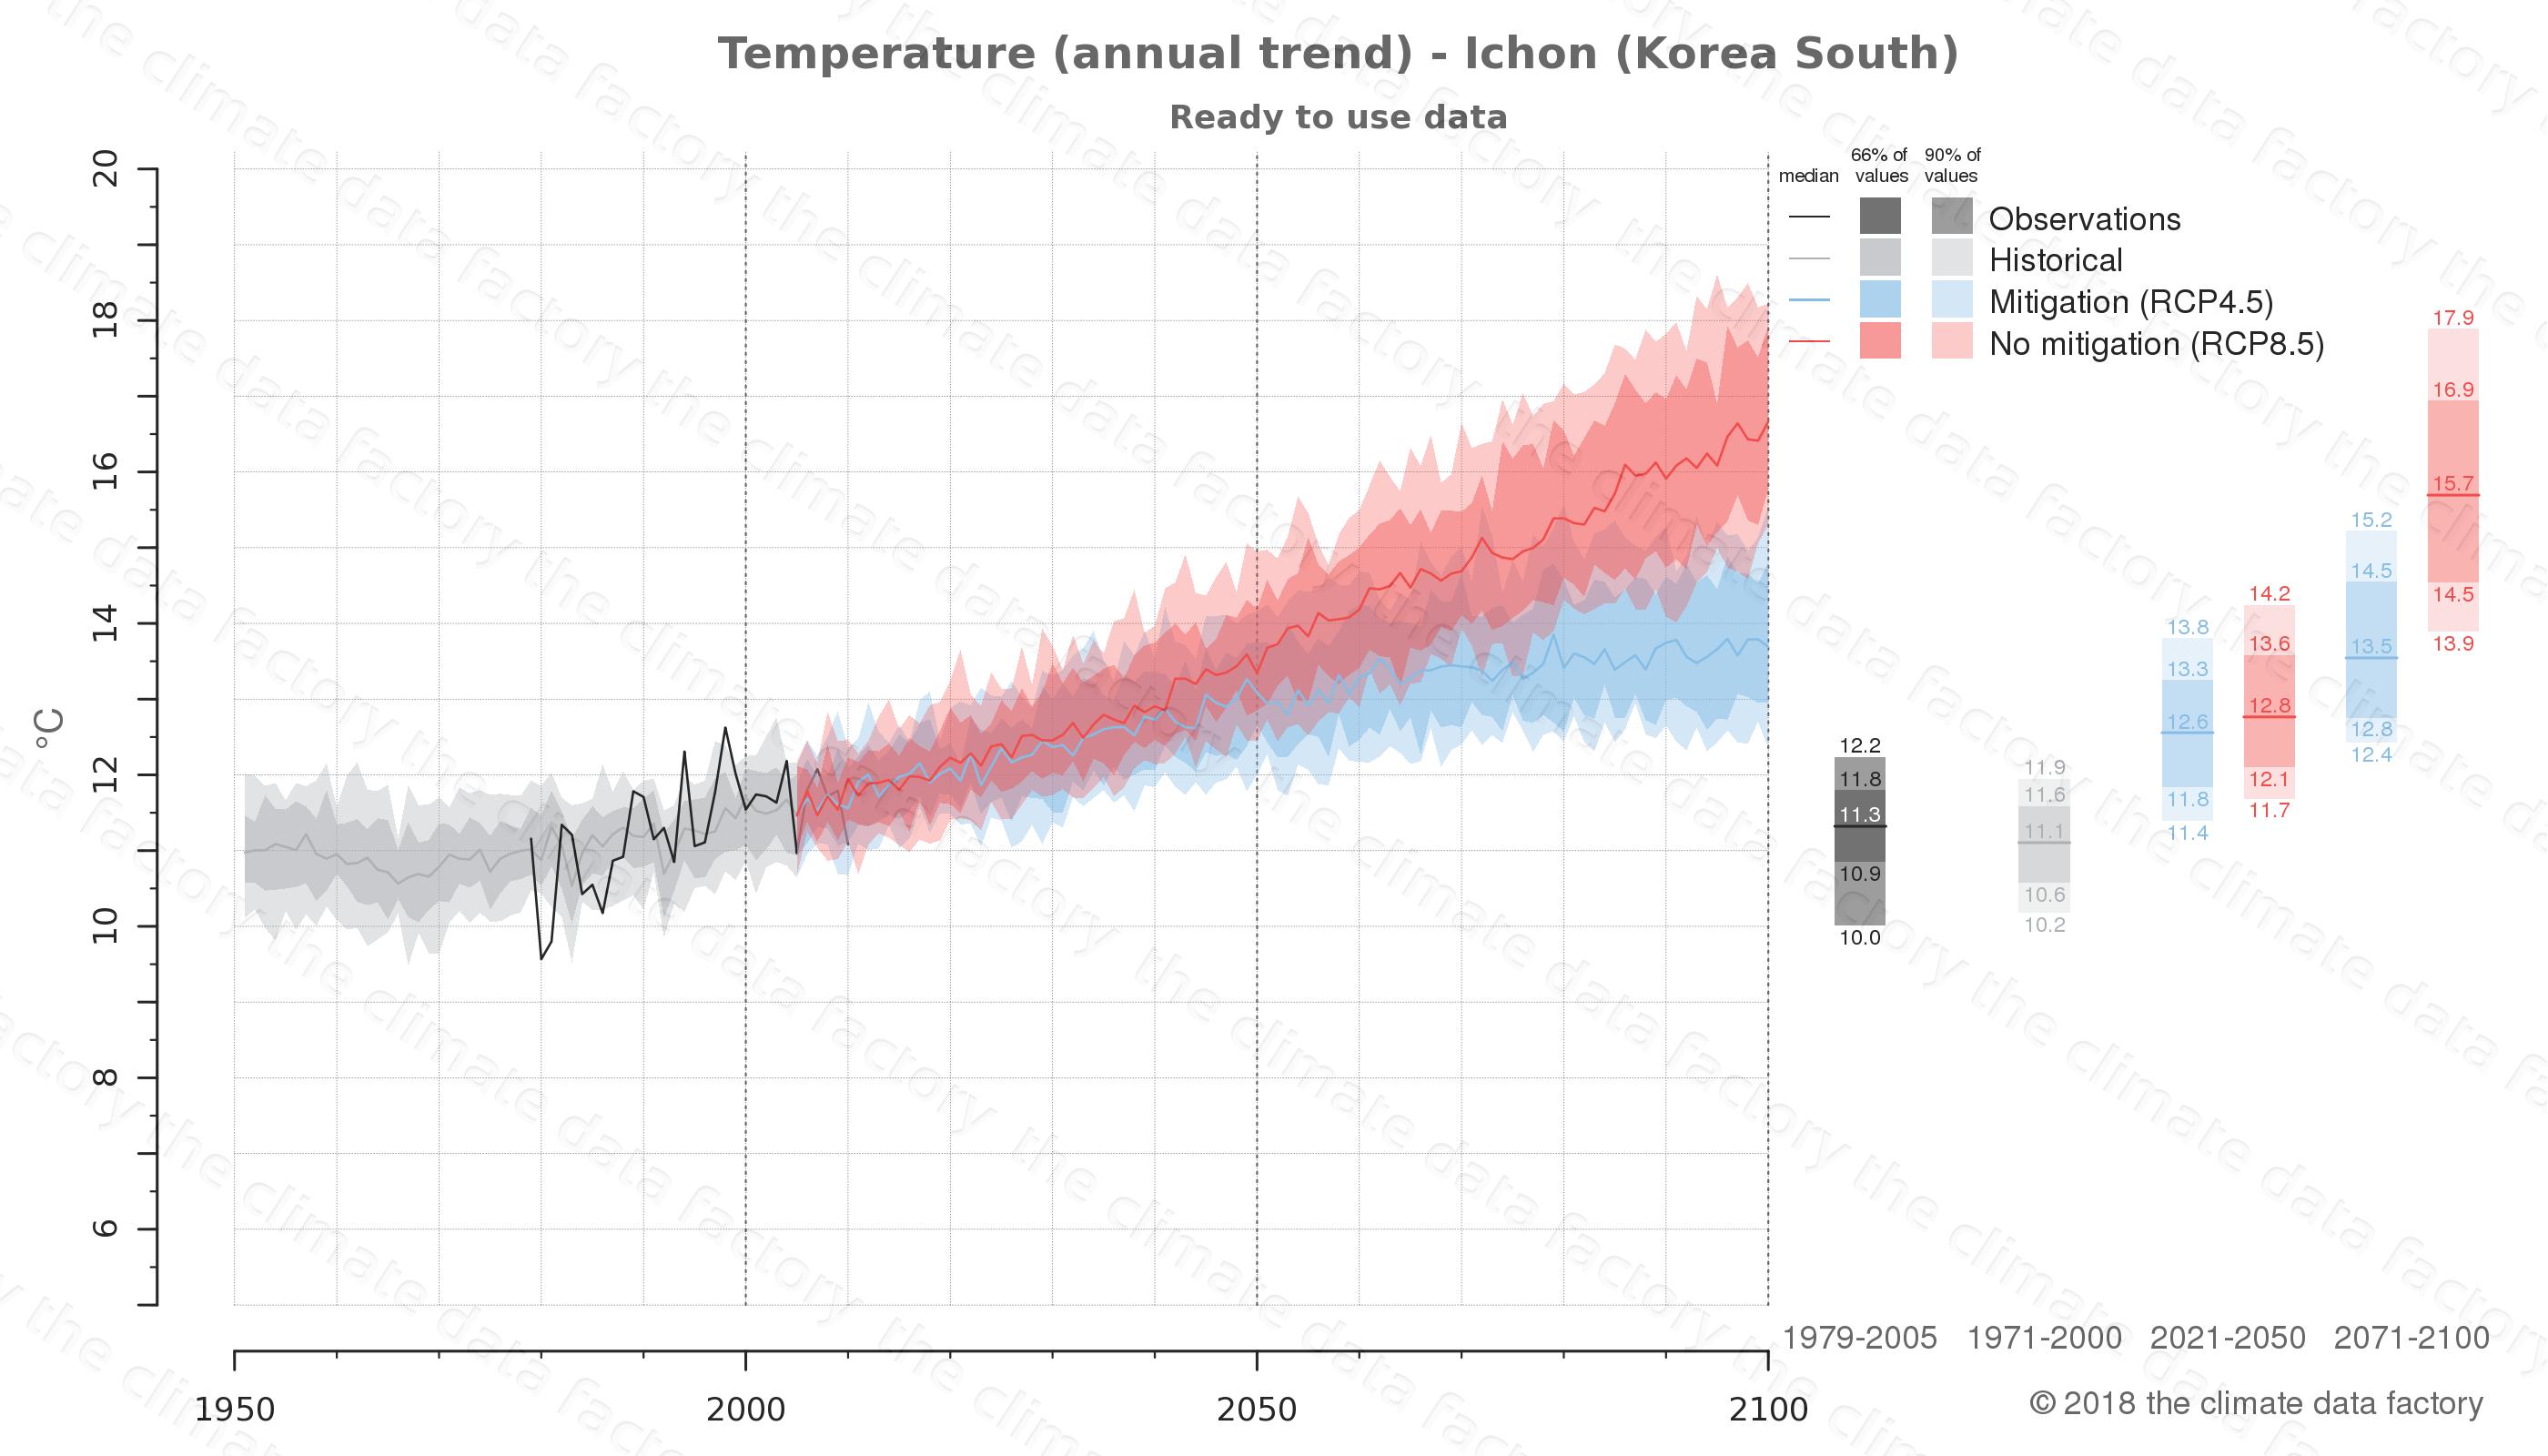 climate change data policy adaptation climate graph city data temperature ichon south korea